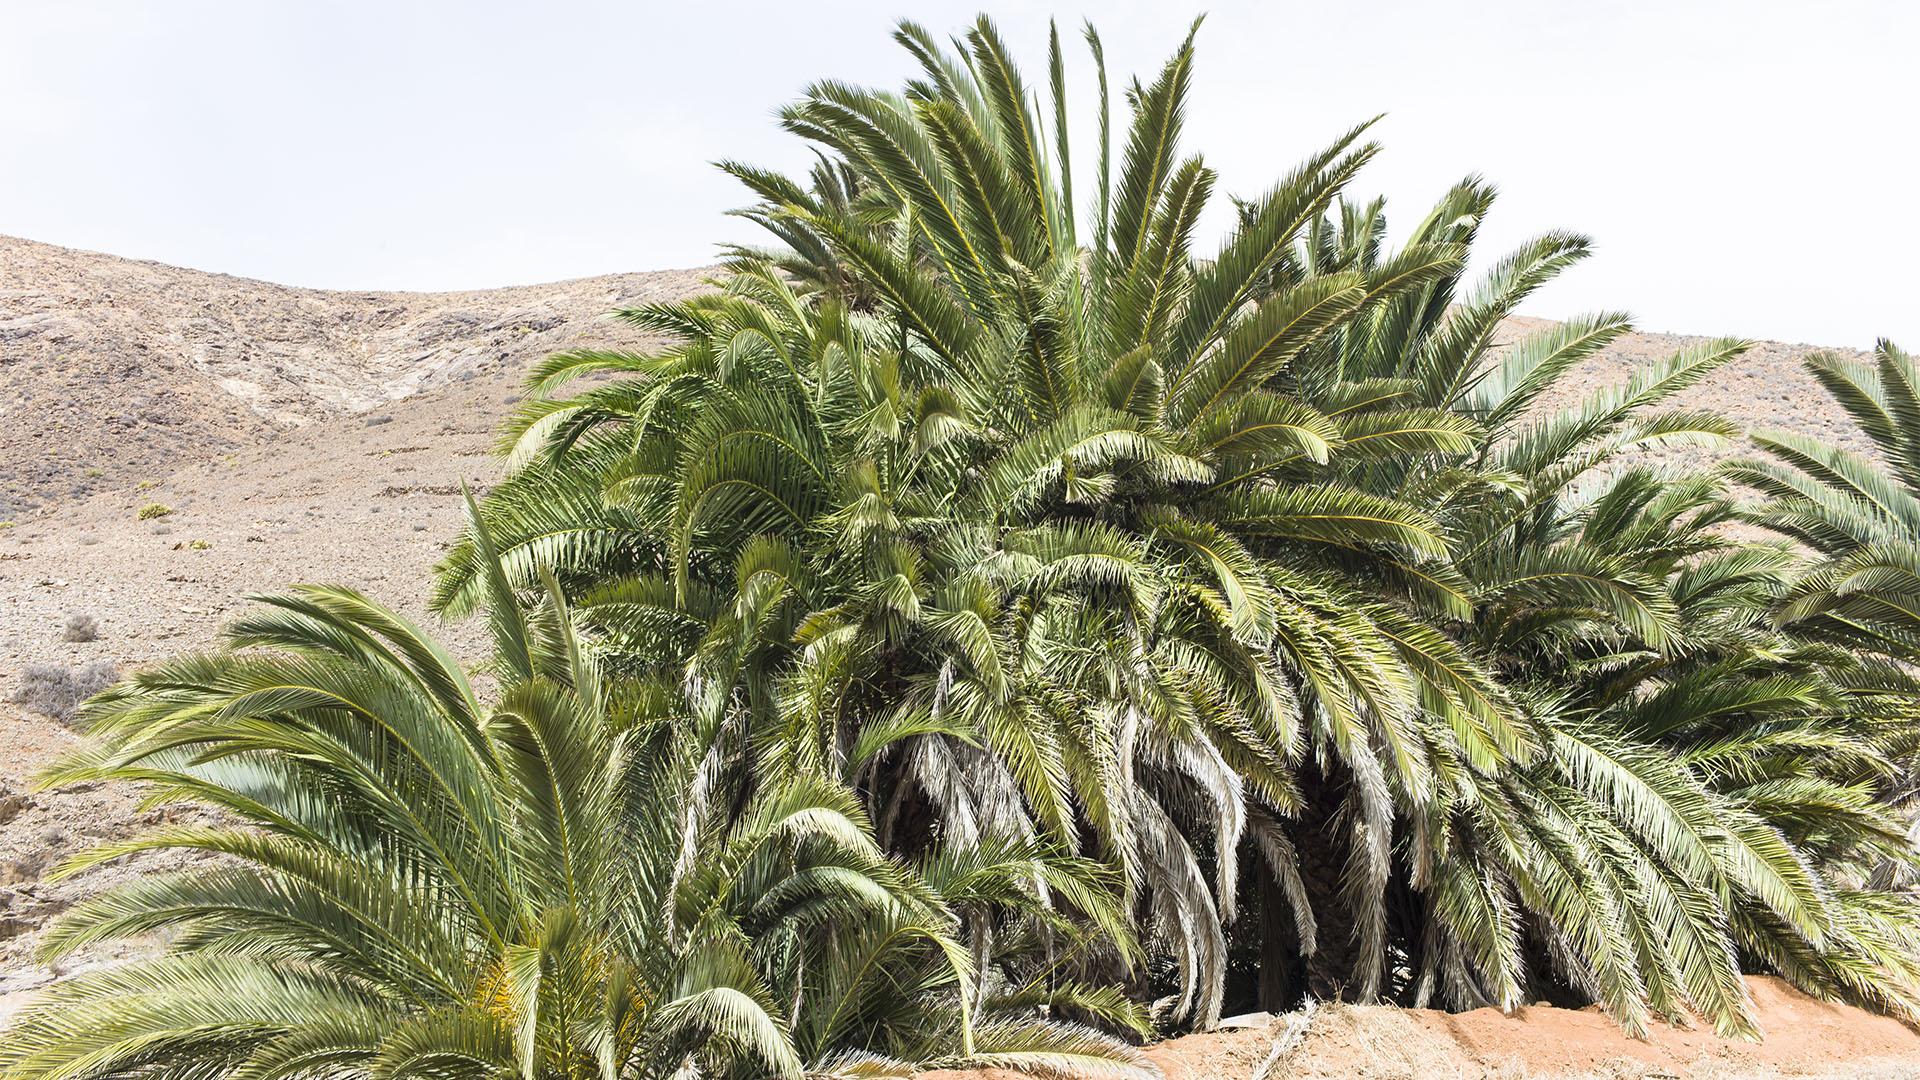 Sehenswürdigkeiten Fuerteventuras: Vega de Río Palmas – Palmental